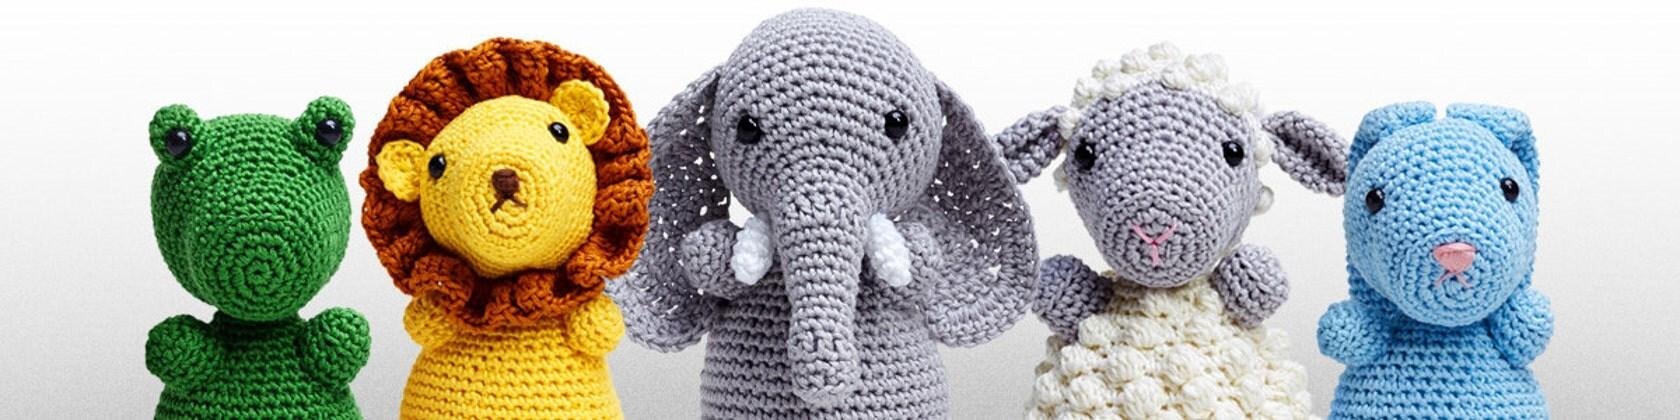 Crochet Animals & Amigurumi Patterns by KATShandmadeitems ...